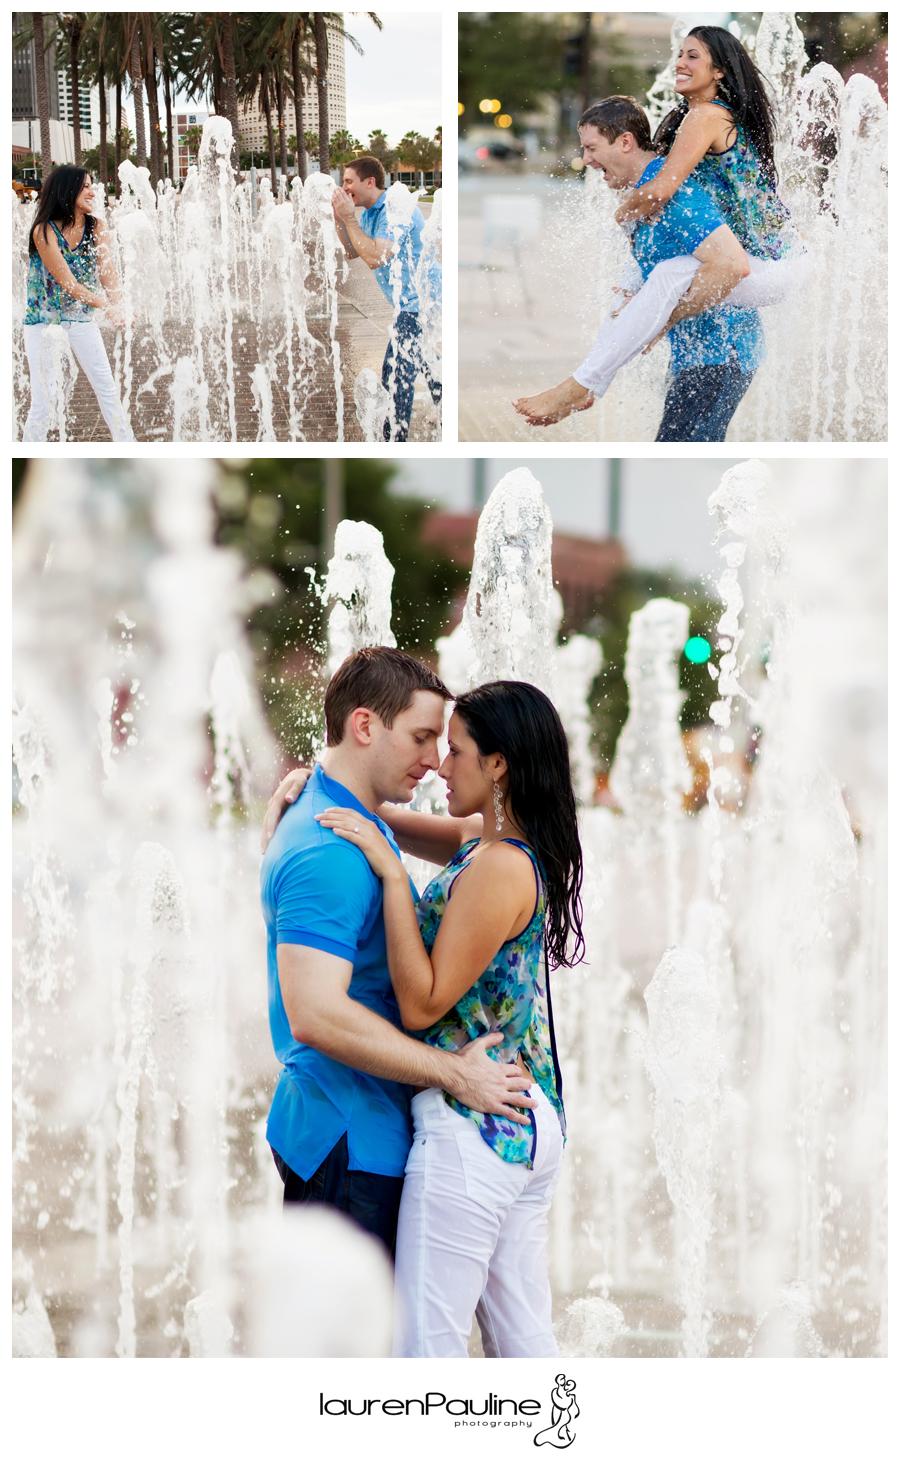 Engagement Images Tampa, FL